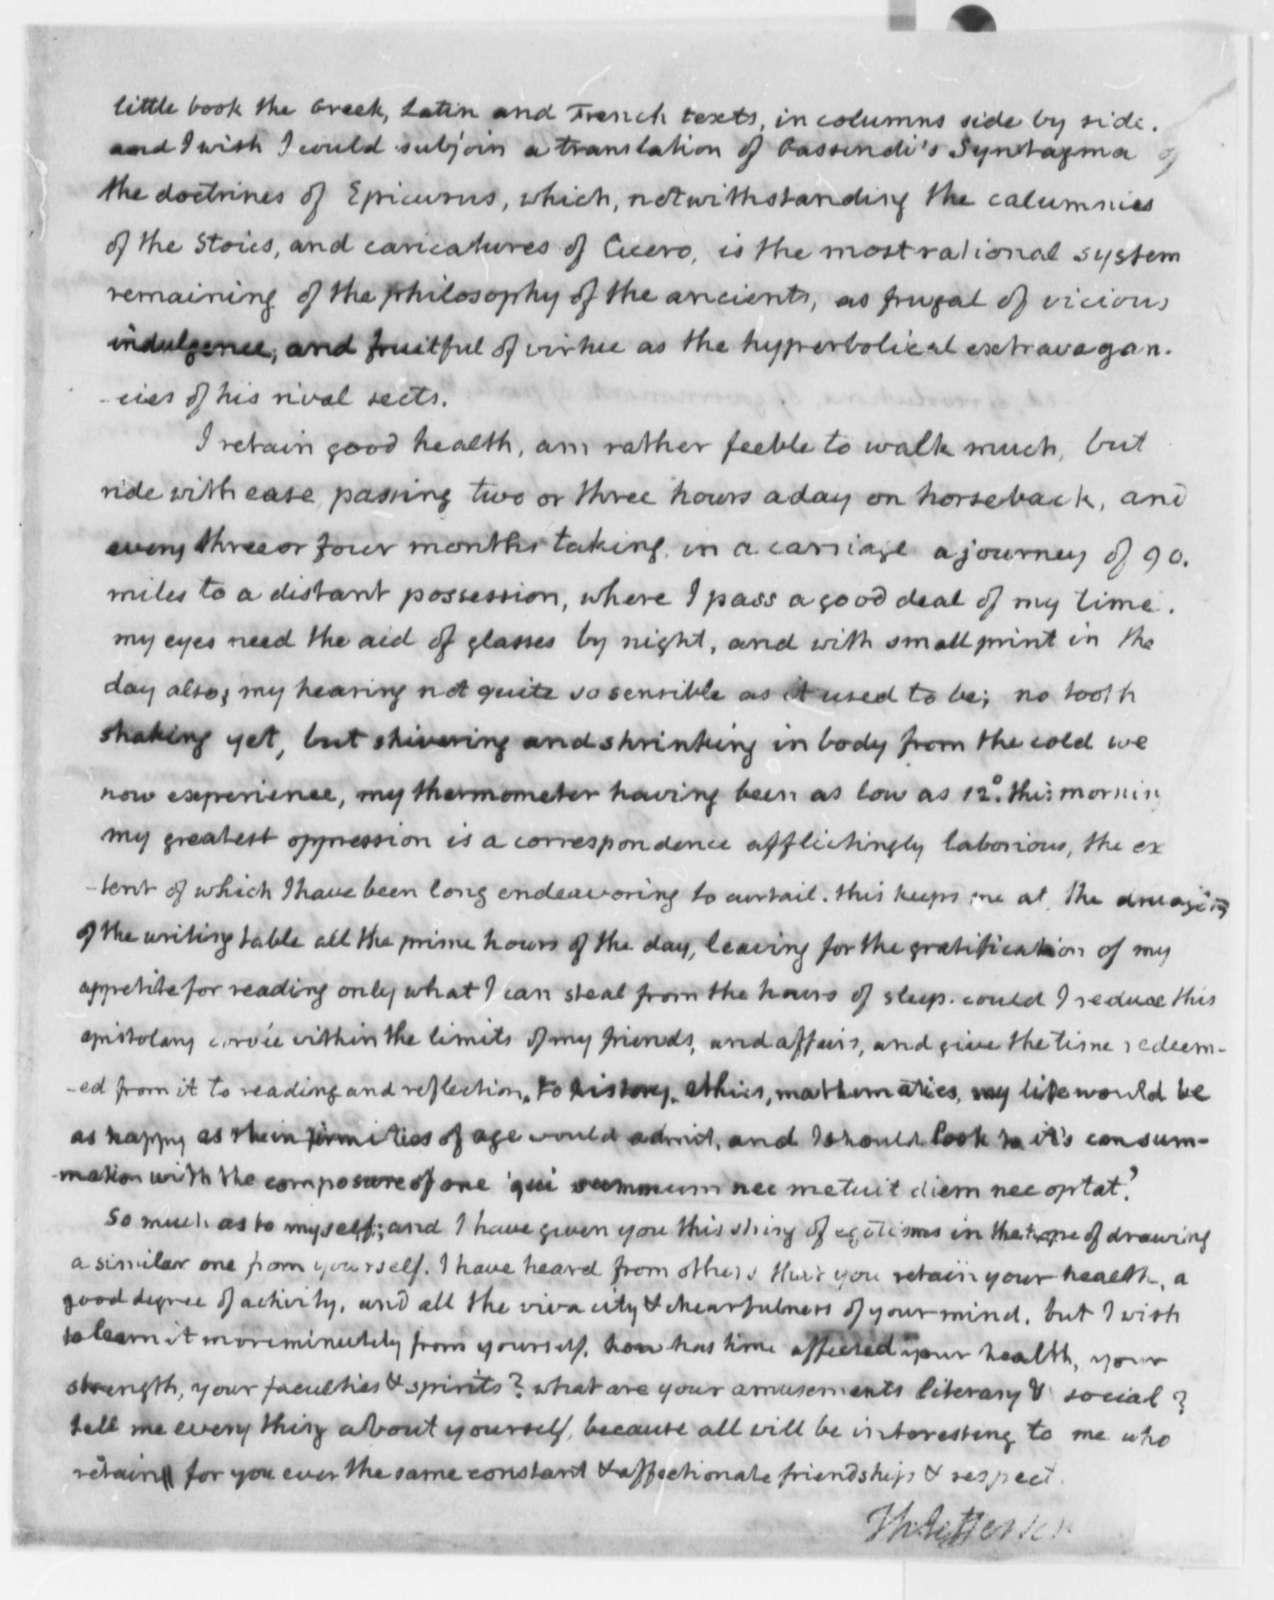 Thomas Jefferson to Charles Thomson, January 9, 1816